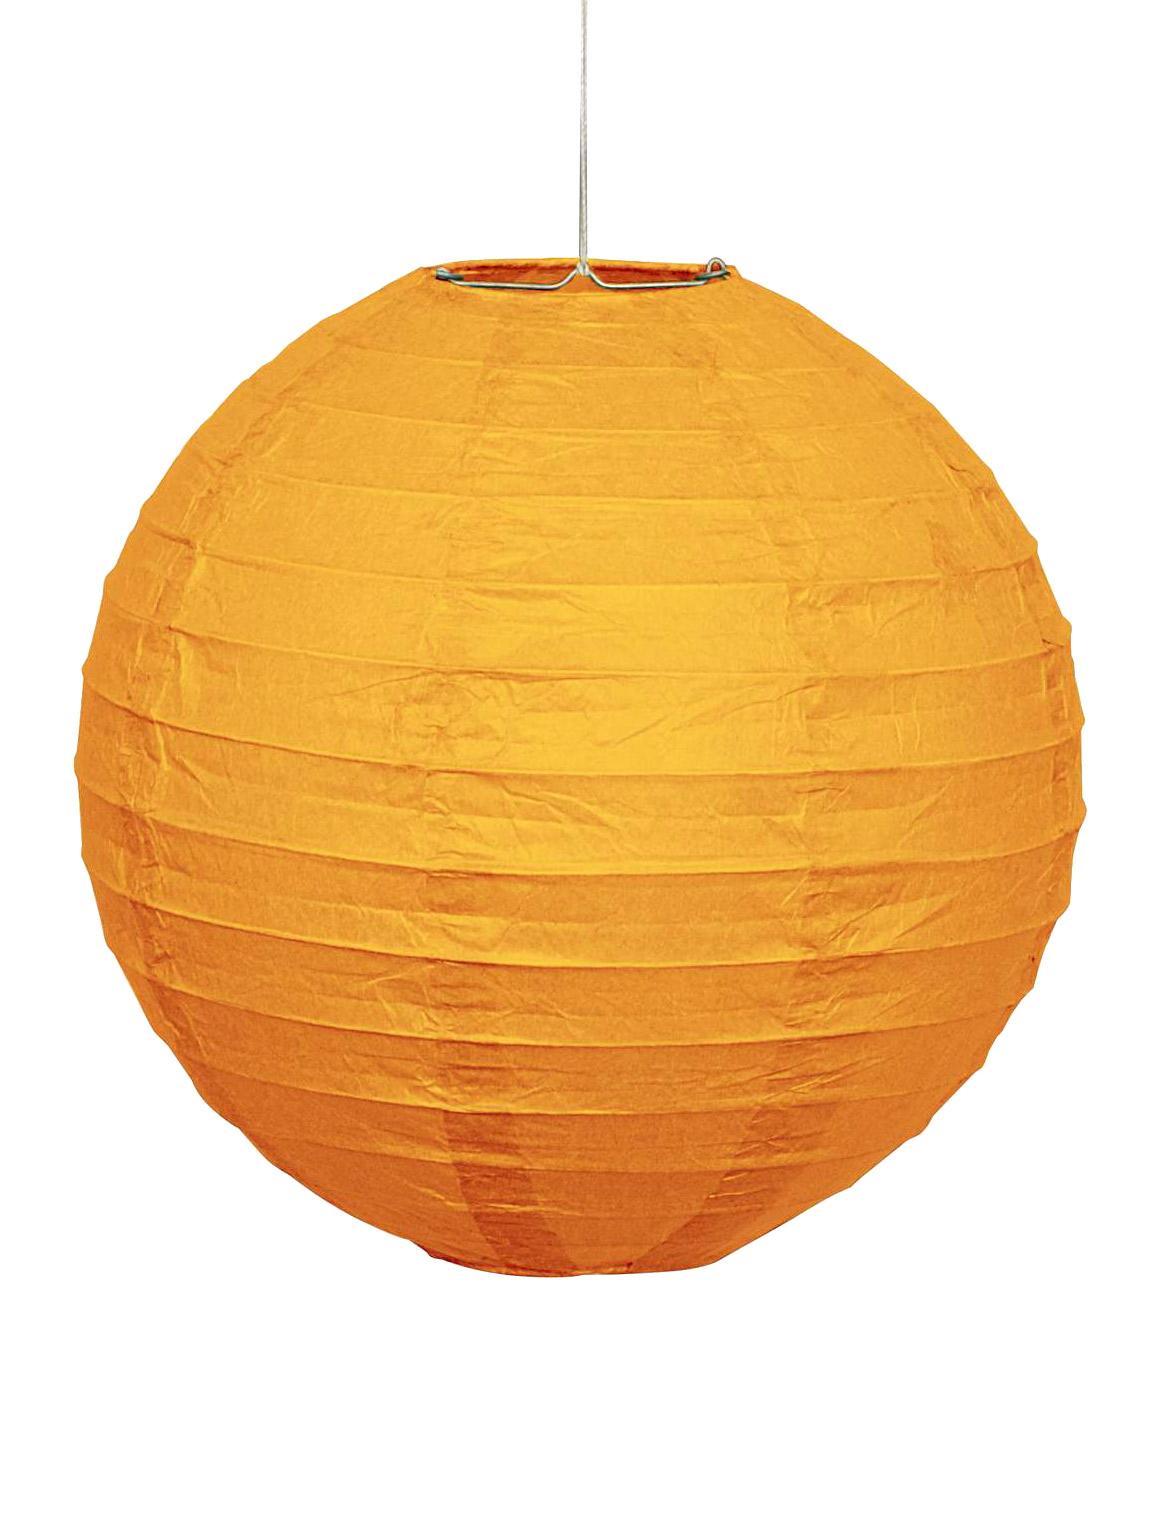 lanterne japonaise orange en papier d coration. Black Bedroom Furniture Sets. Home Design Ideas